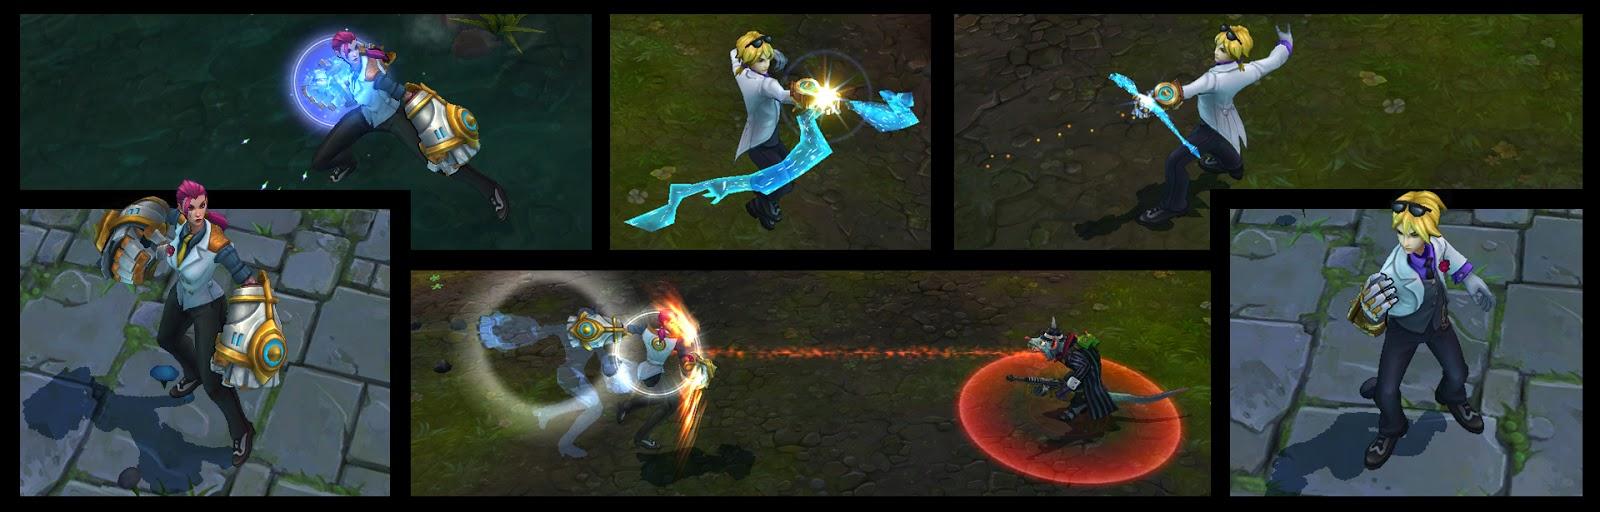 League of Legends: Debonair Vi and Ezreal have arrived